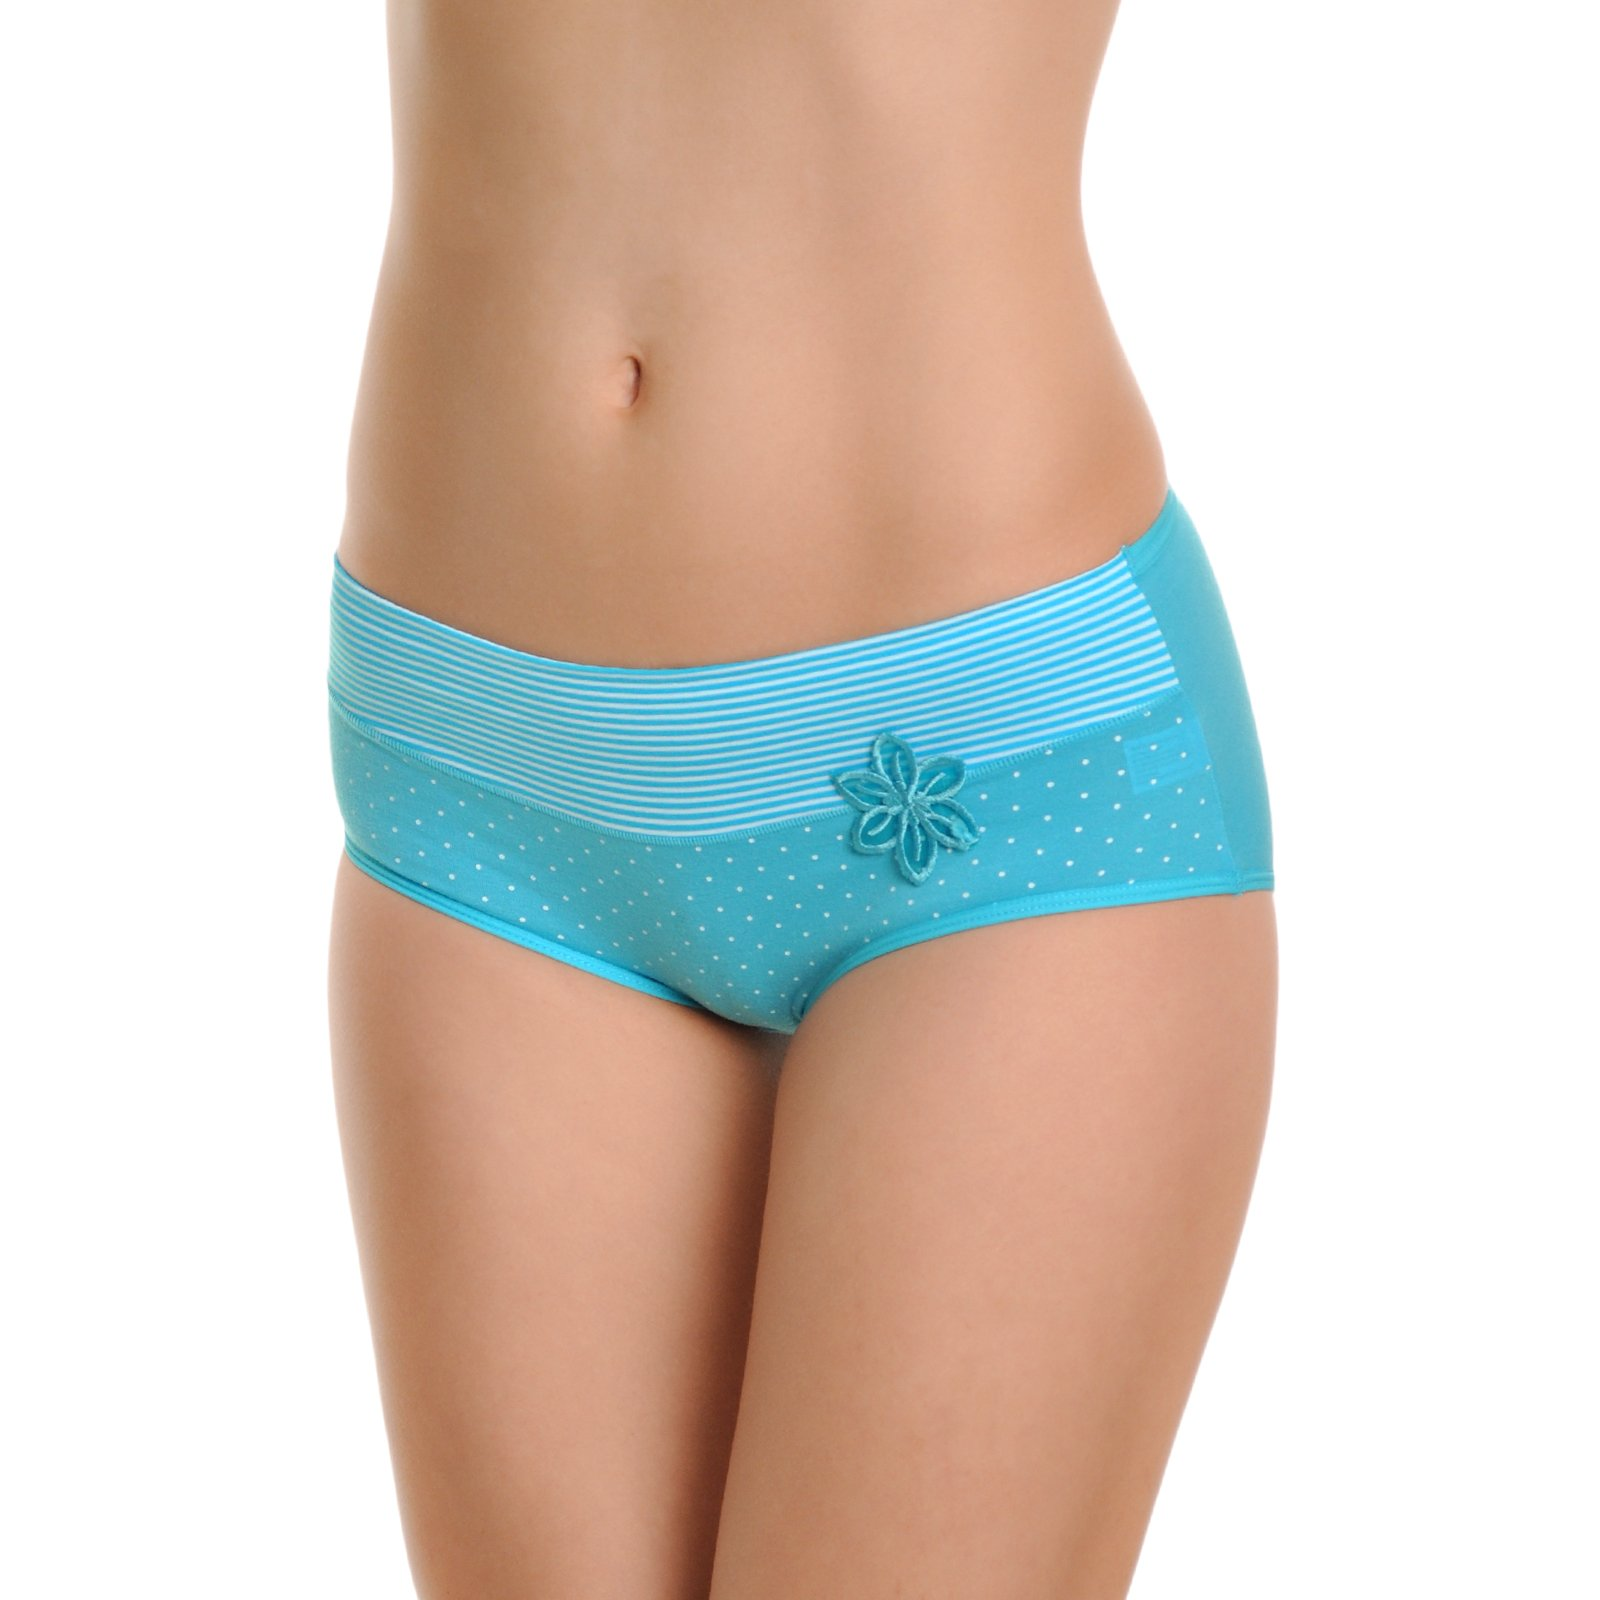 Angelina Women's Cotton Spandex Hiphuggers Panties (12-Pack)